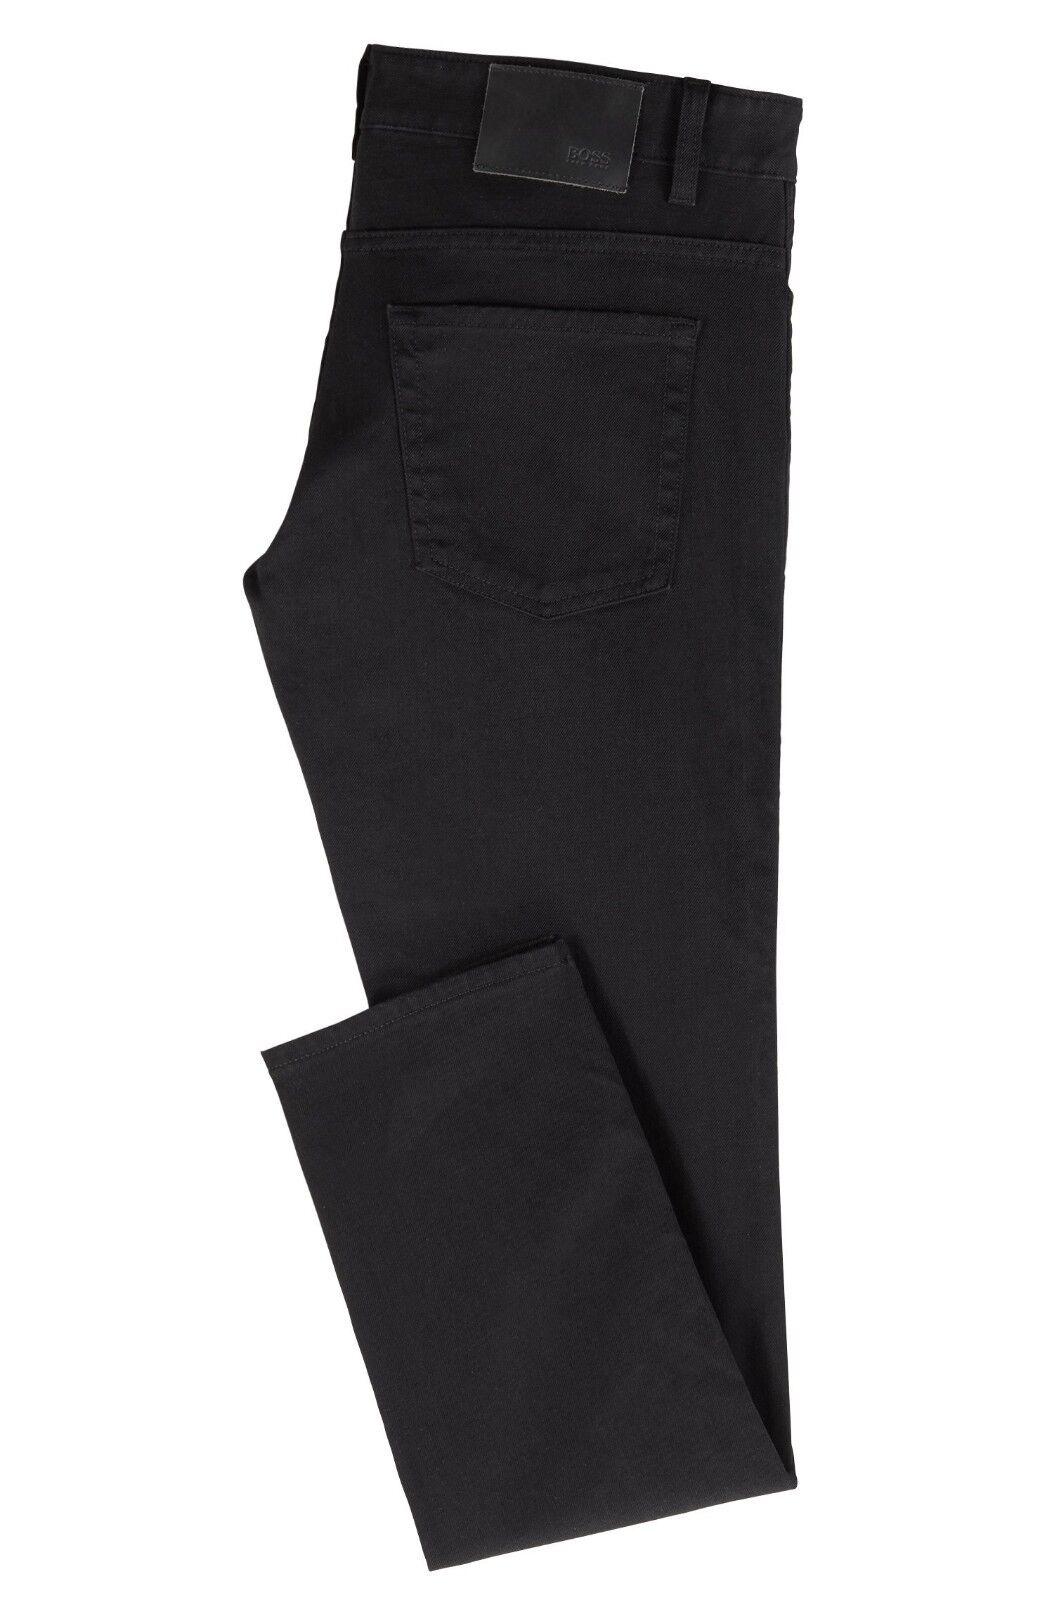 Hugo Boss Delaware3 Schmale Passform Passform Passform Schwarz Jeans 5ef46c